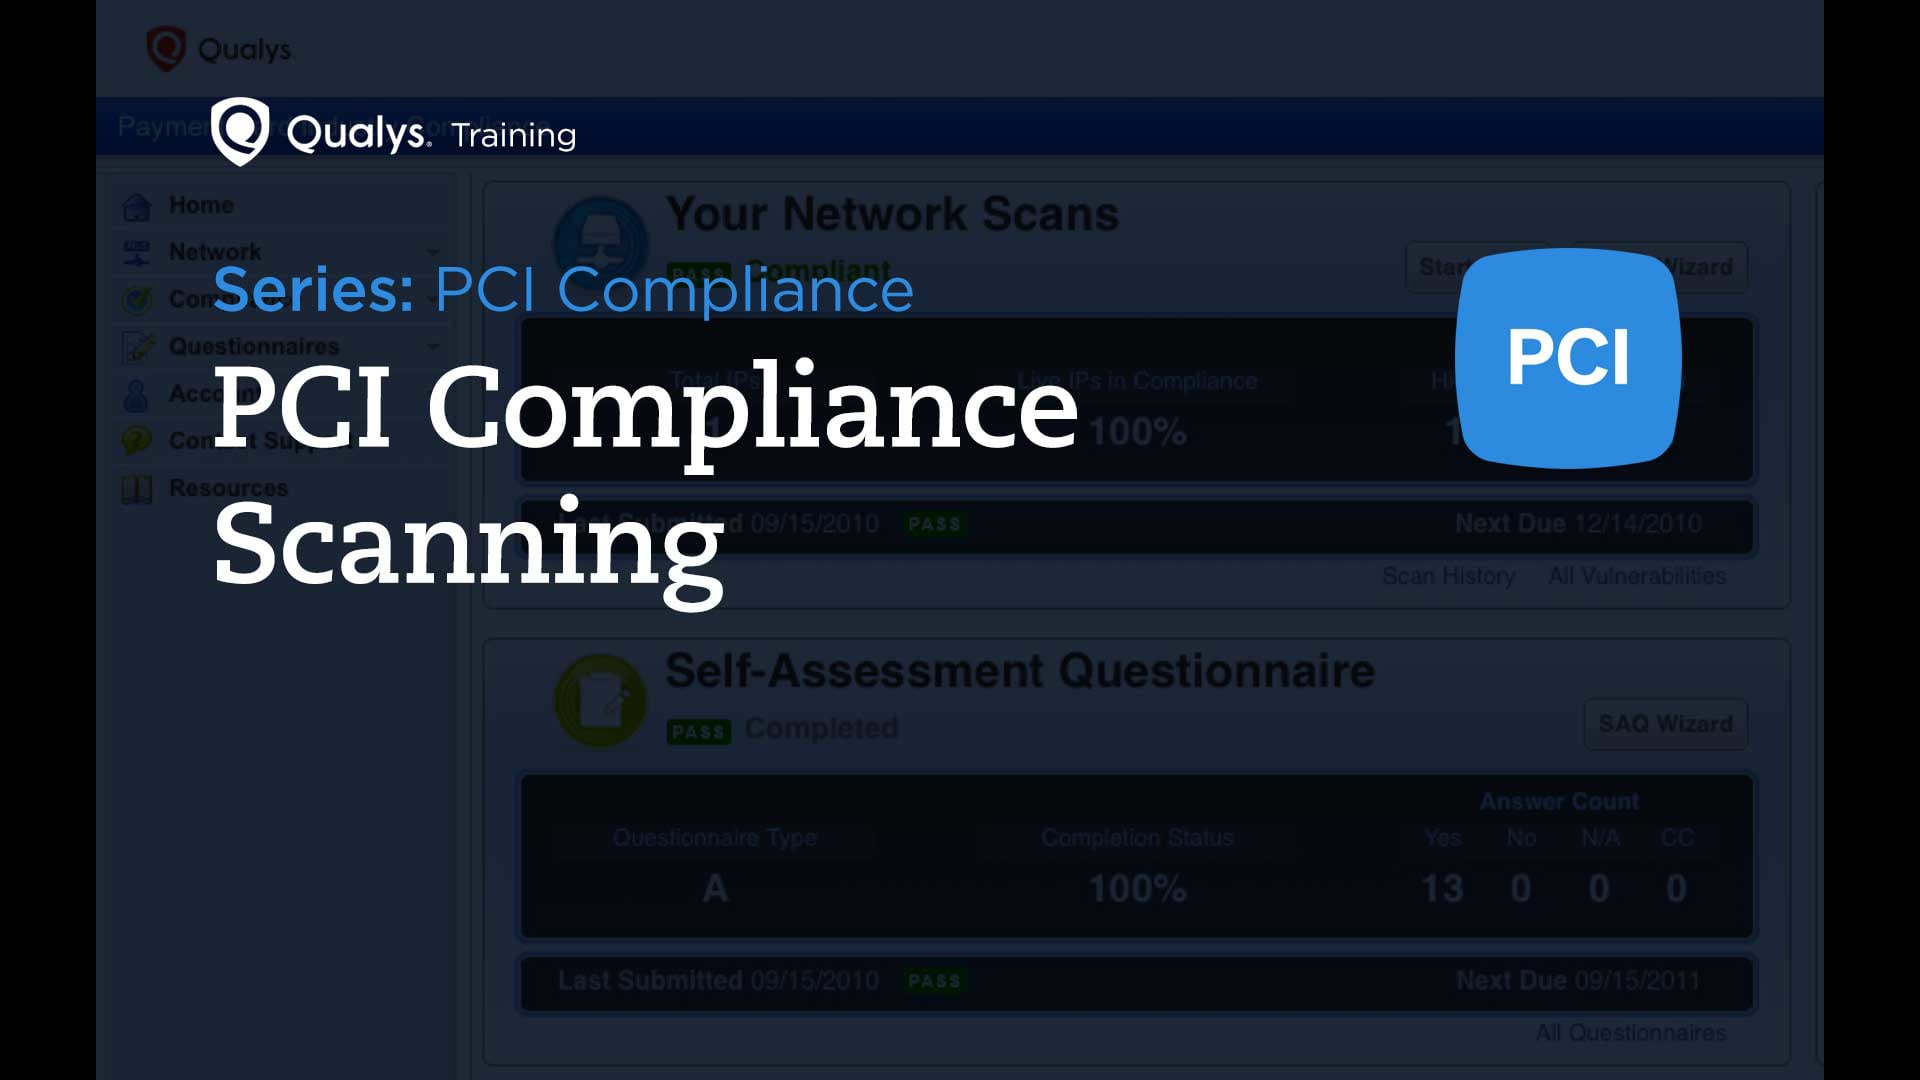 PCI Compliance Scanning